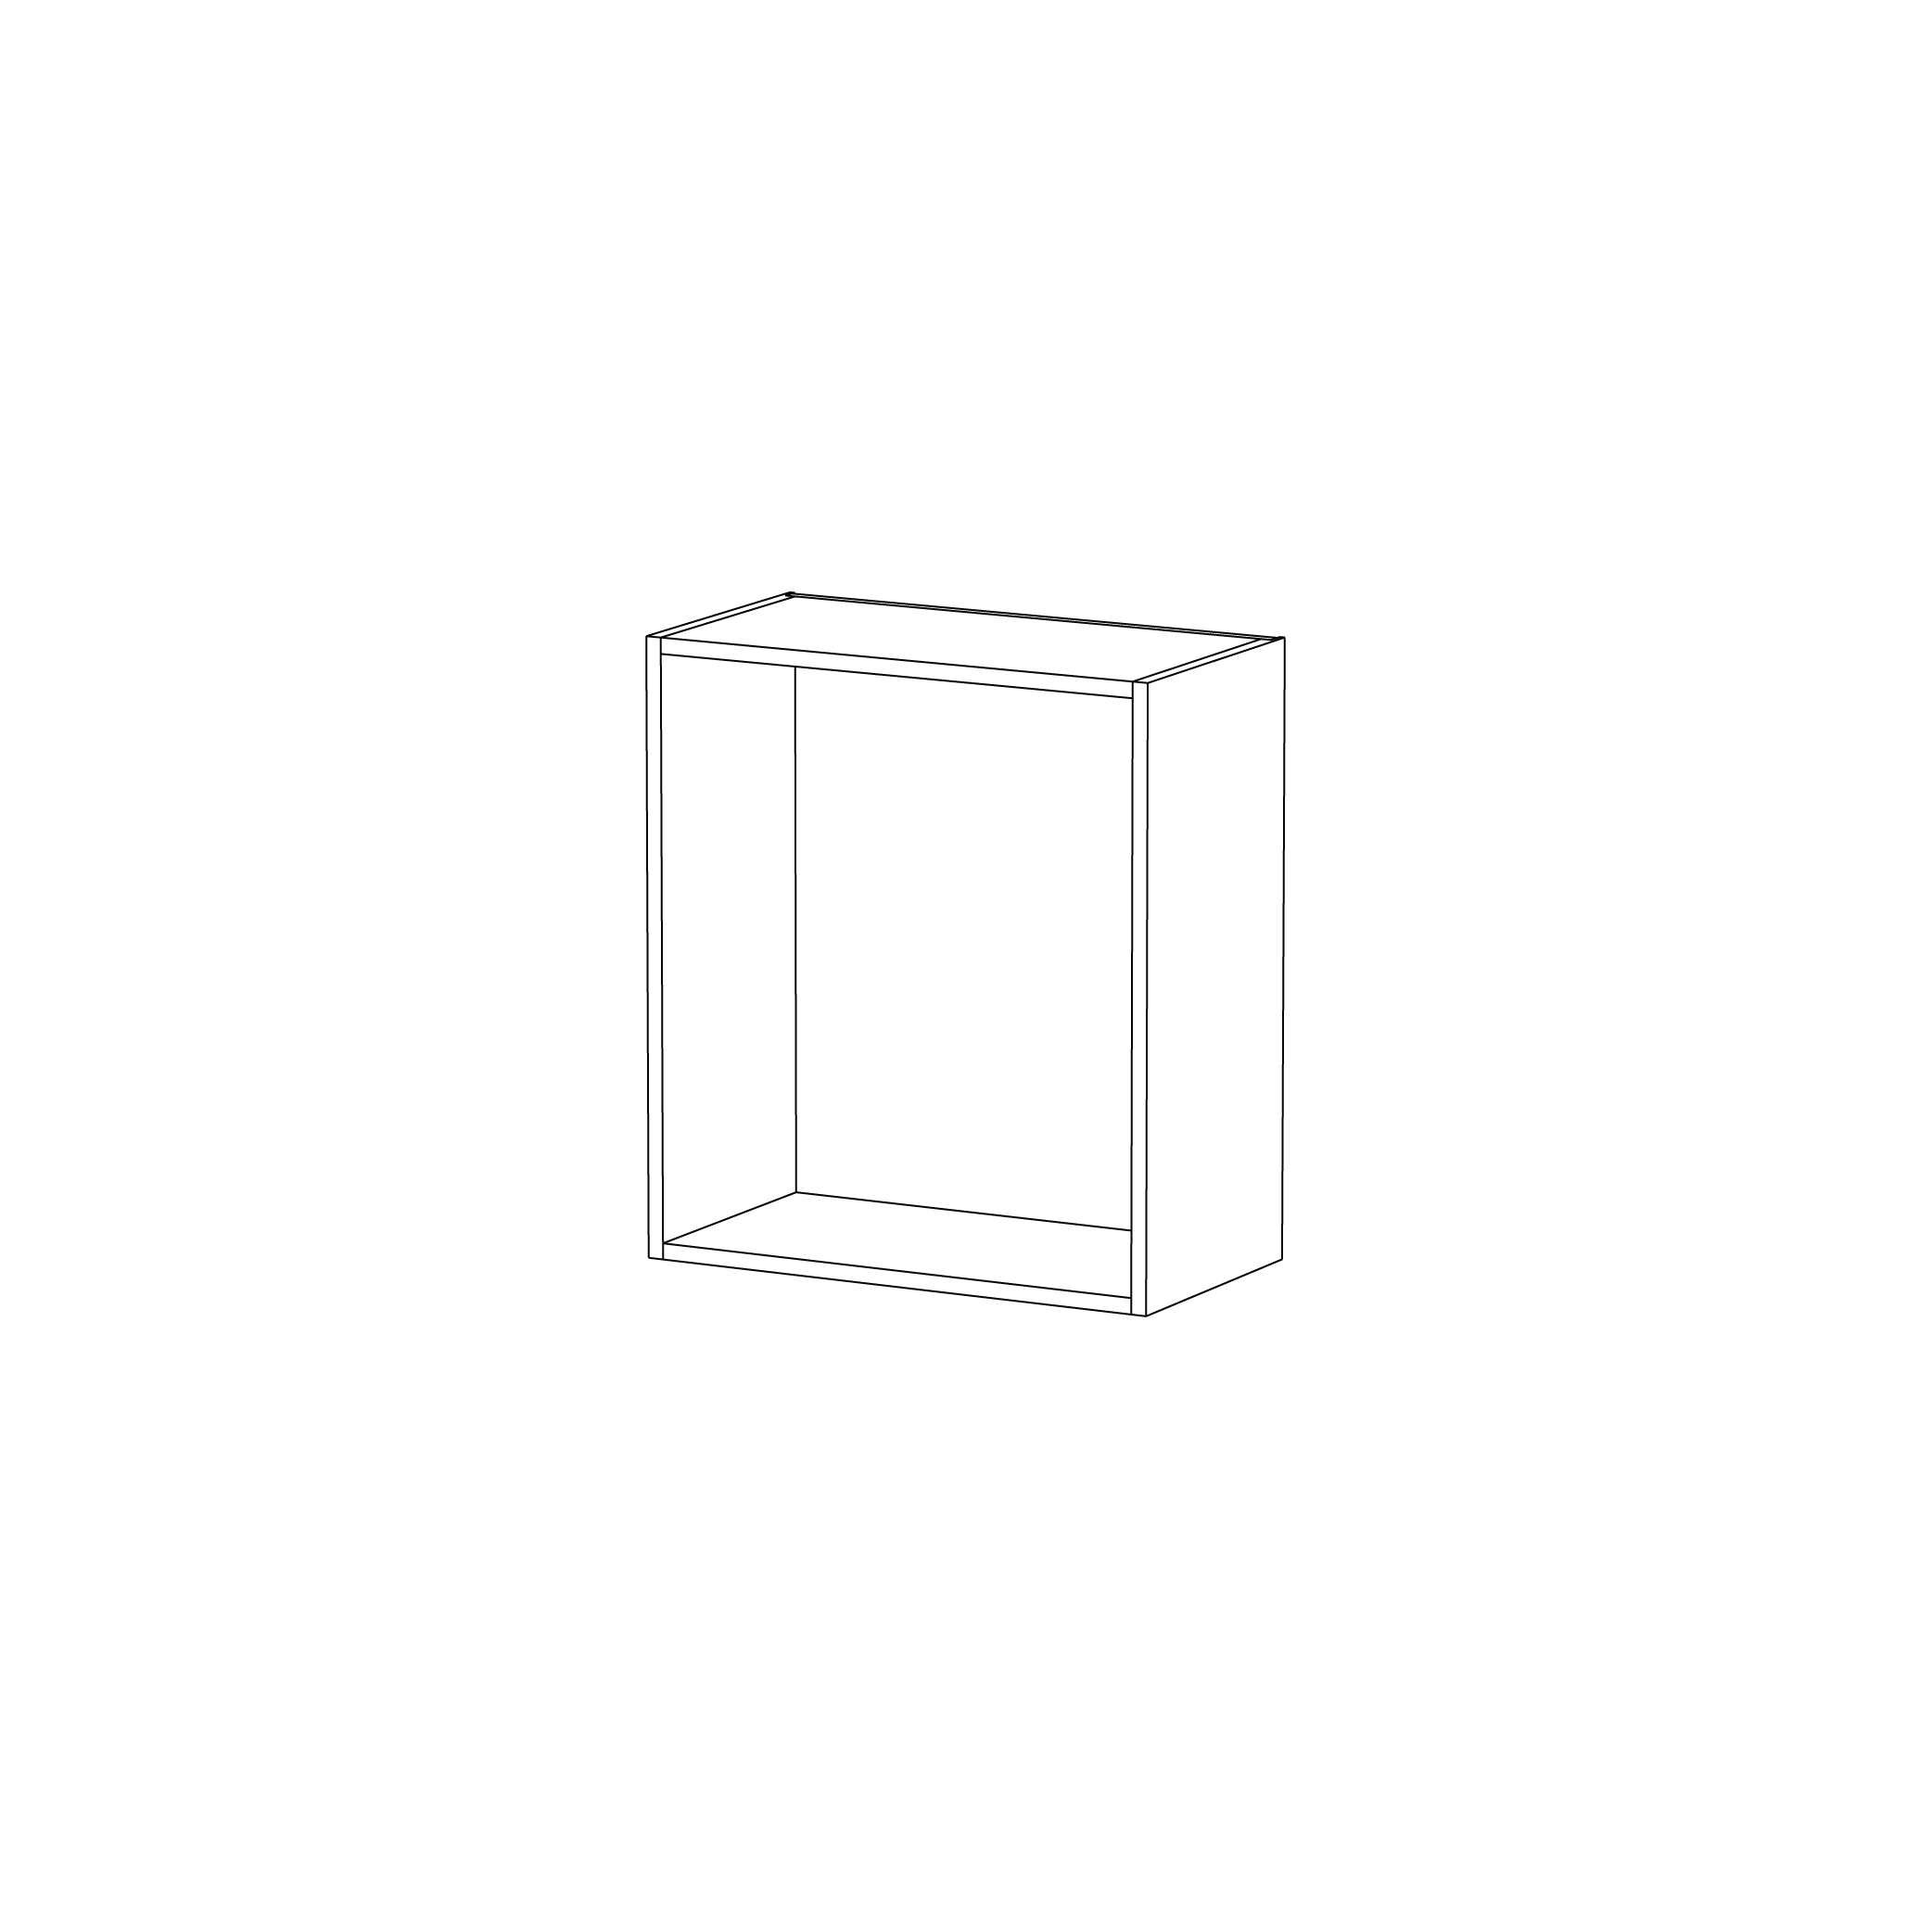 DISPLAY 2/6